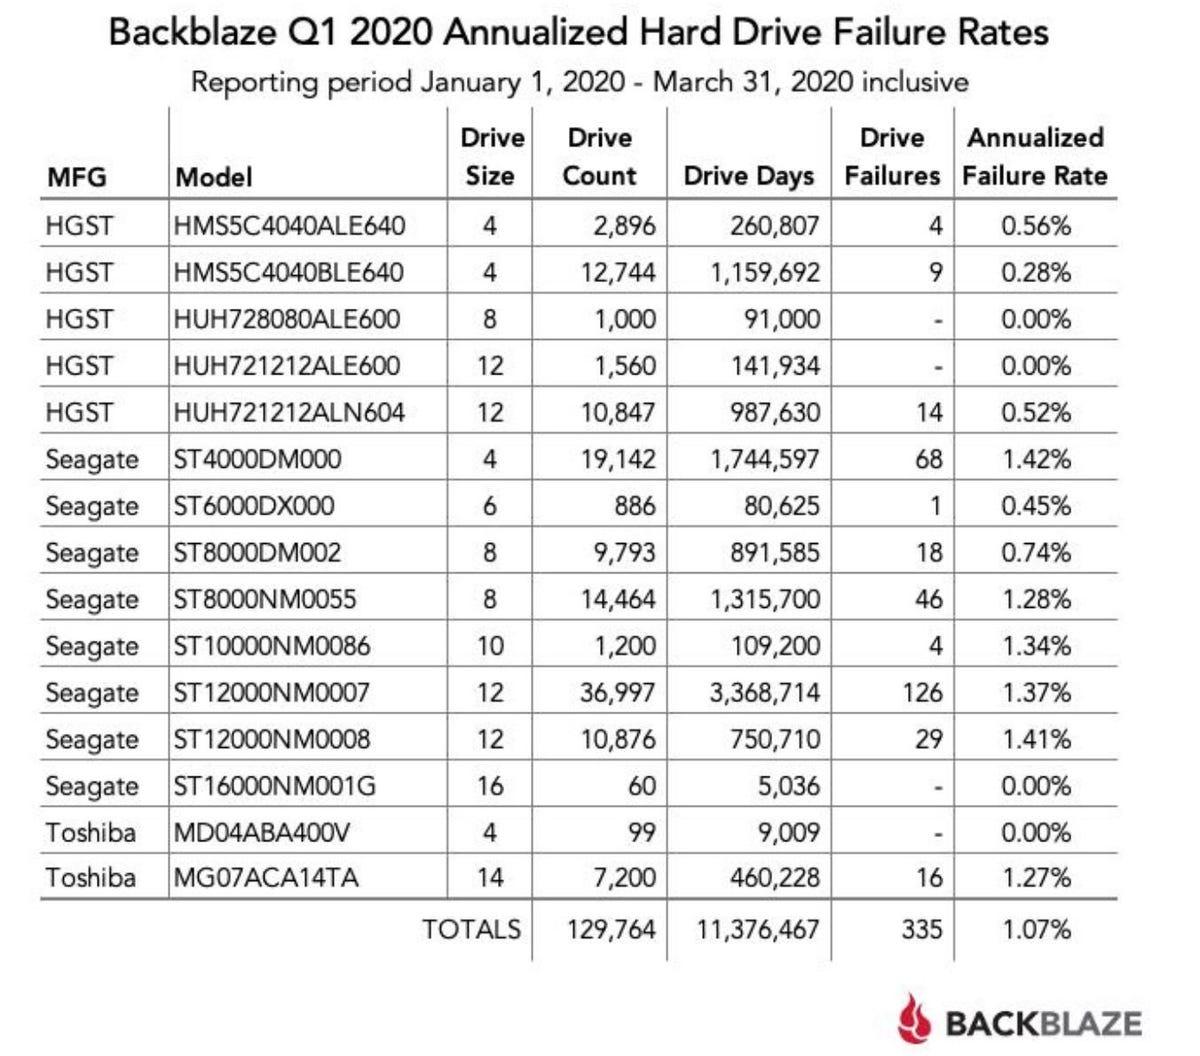 Backblaze data Q1 2020